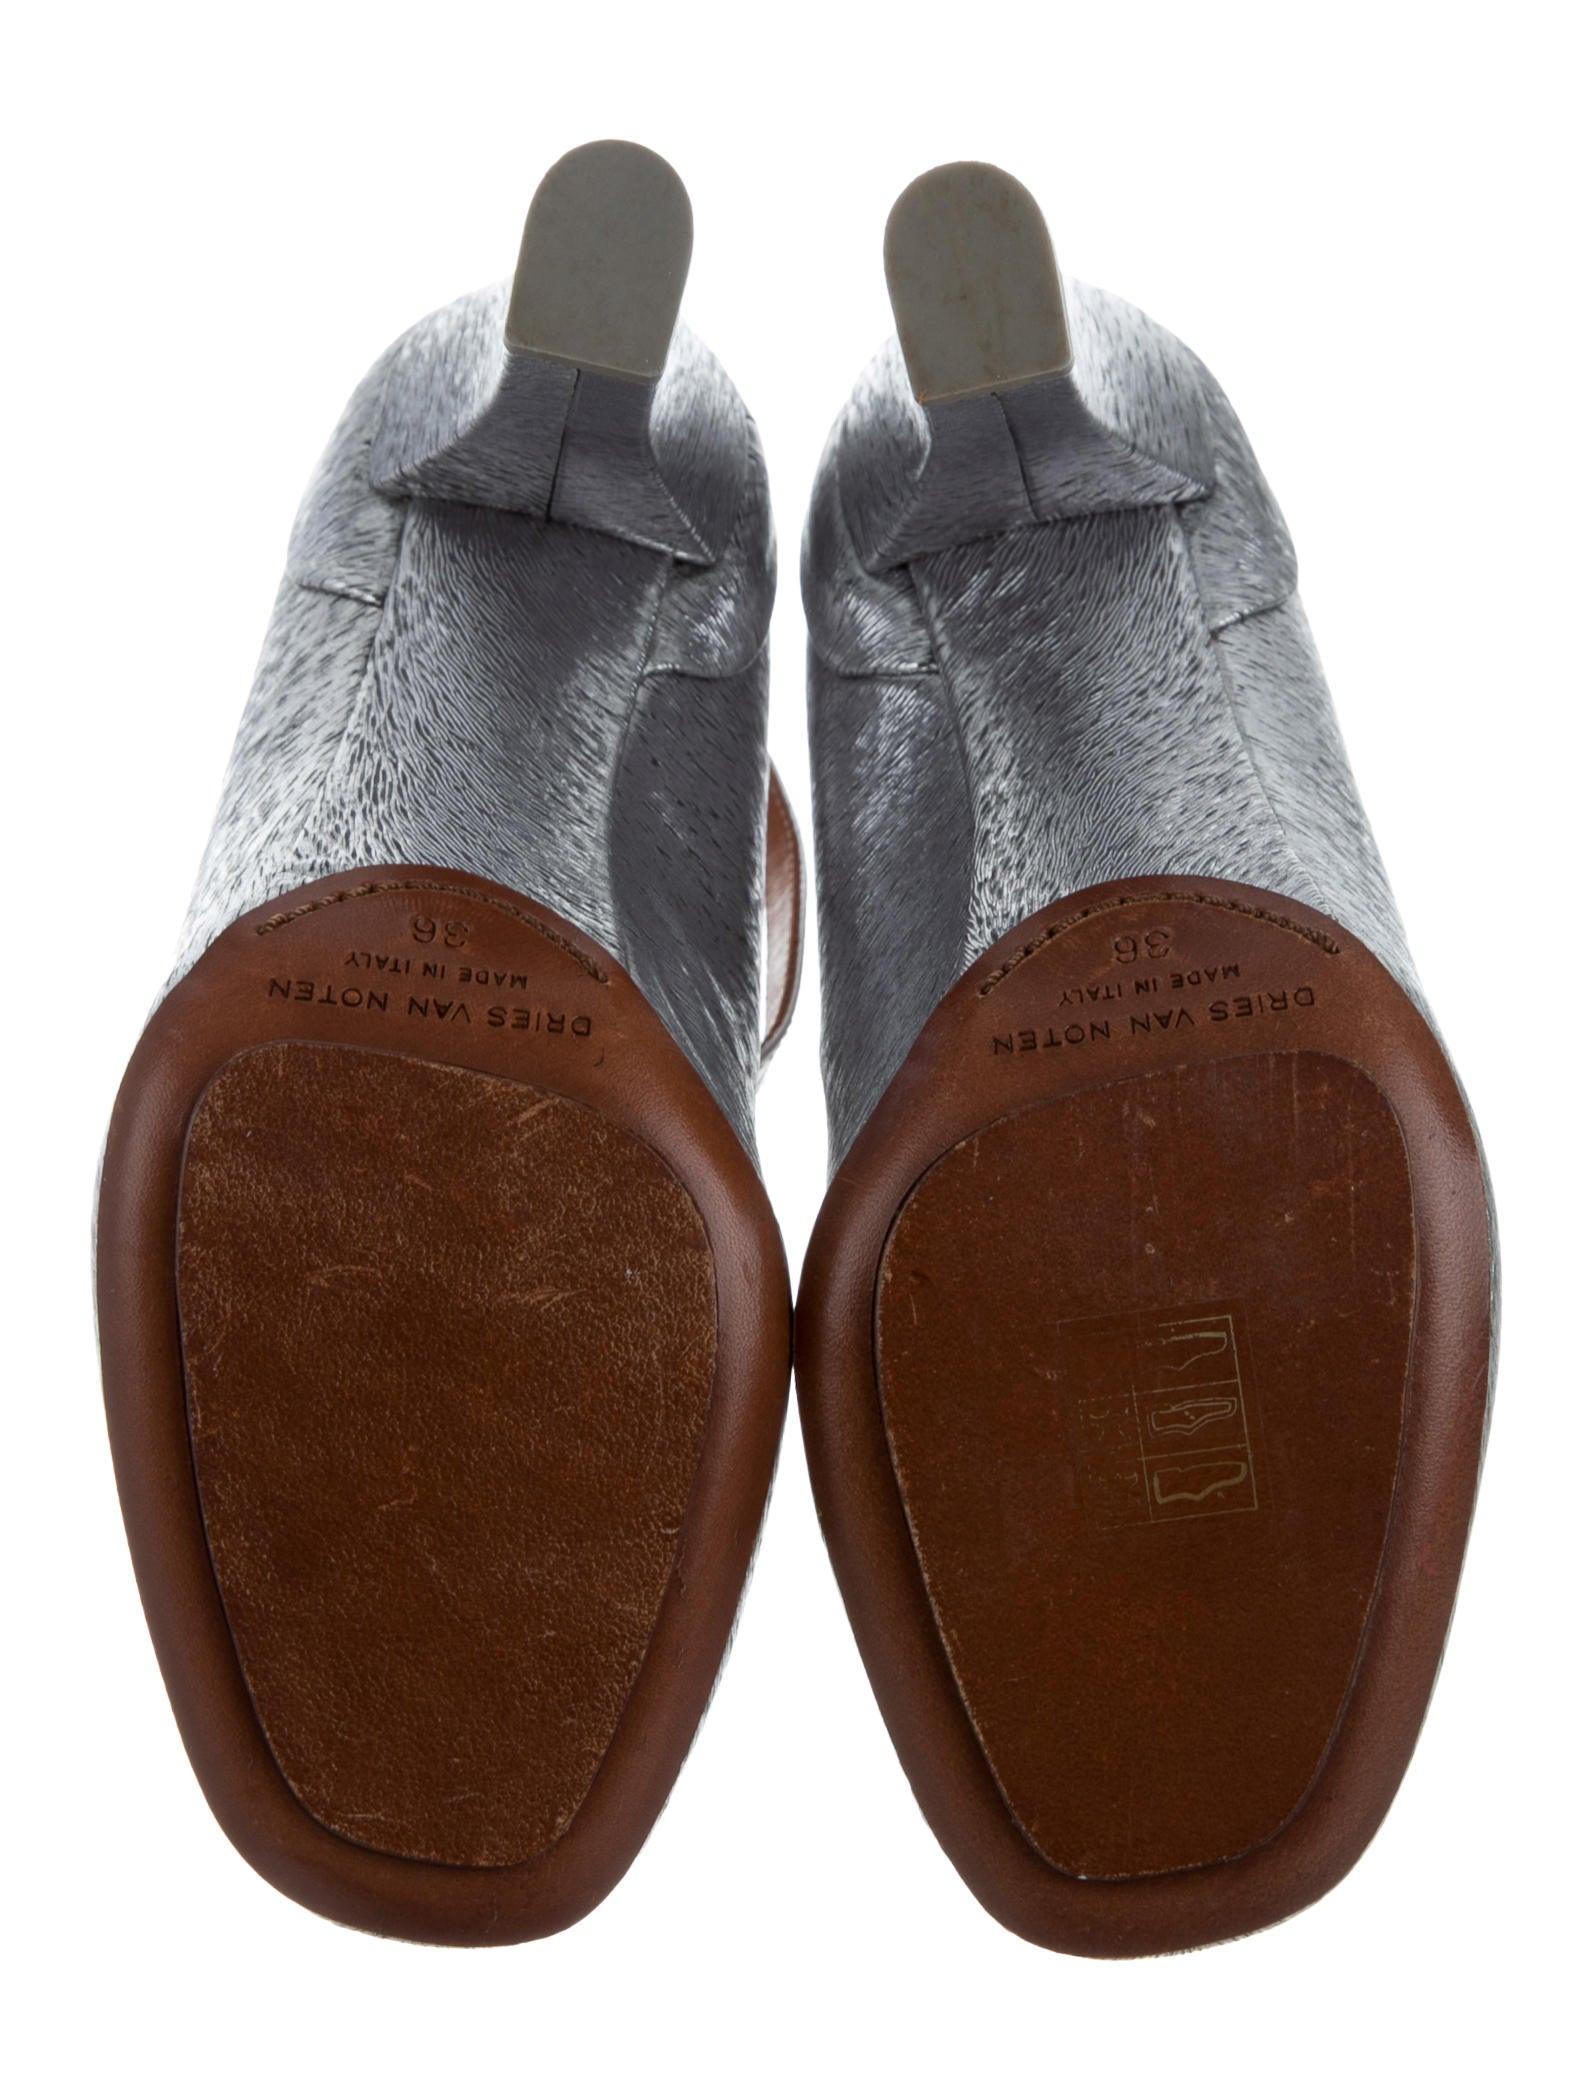 Dries Van Noten Silver Shoes Pumps